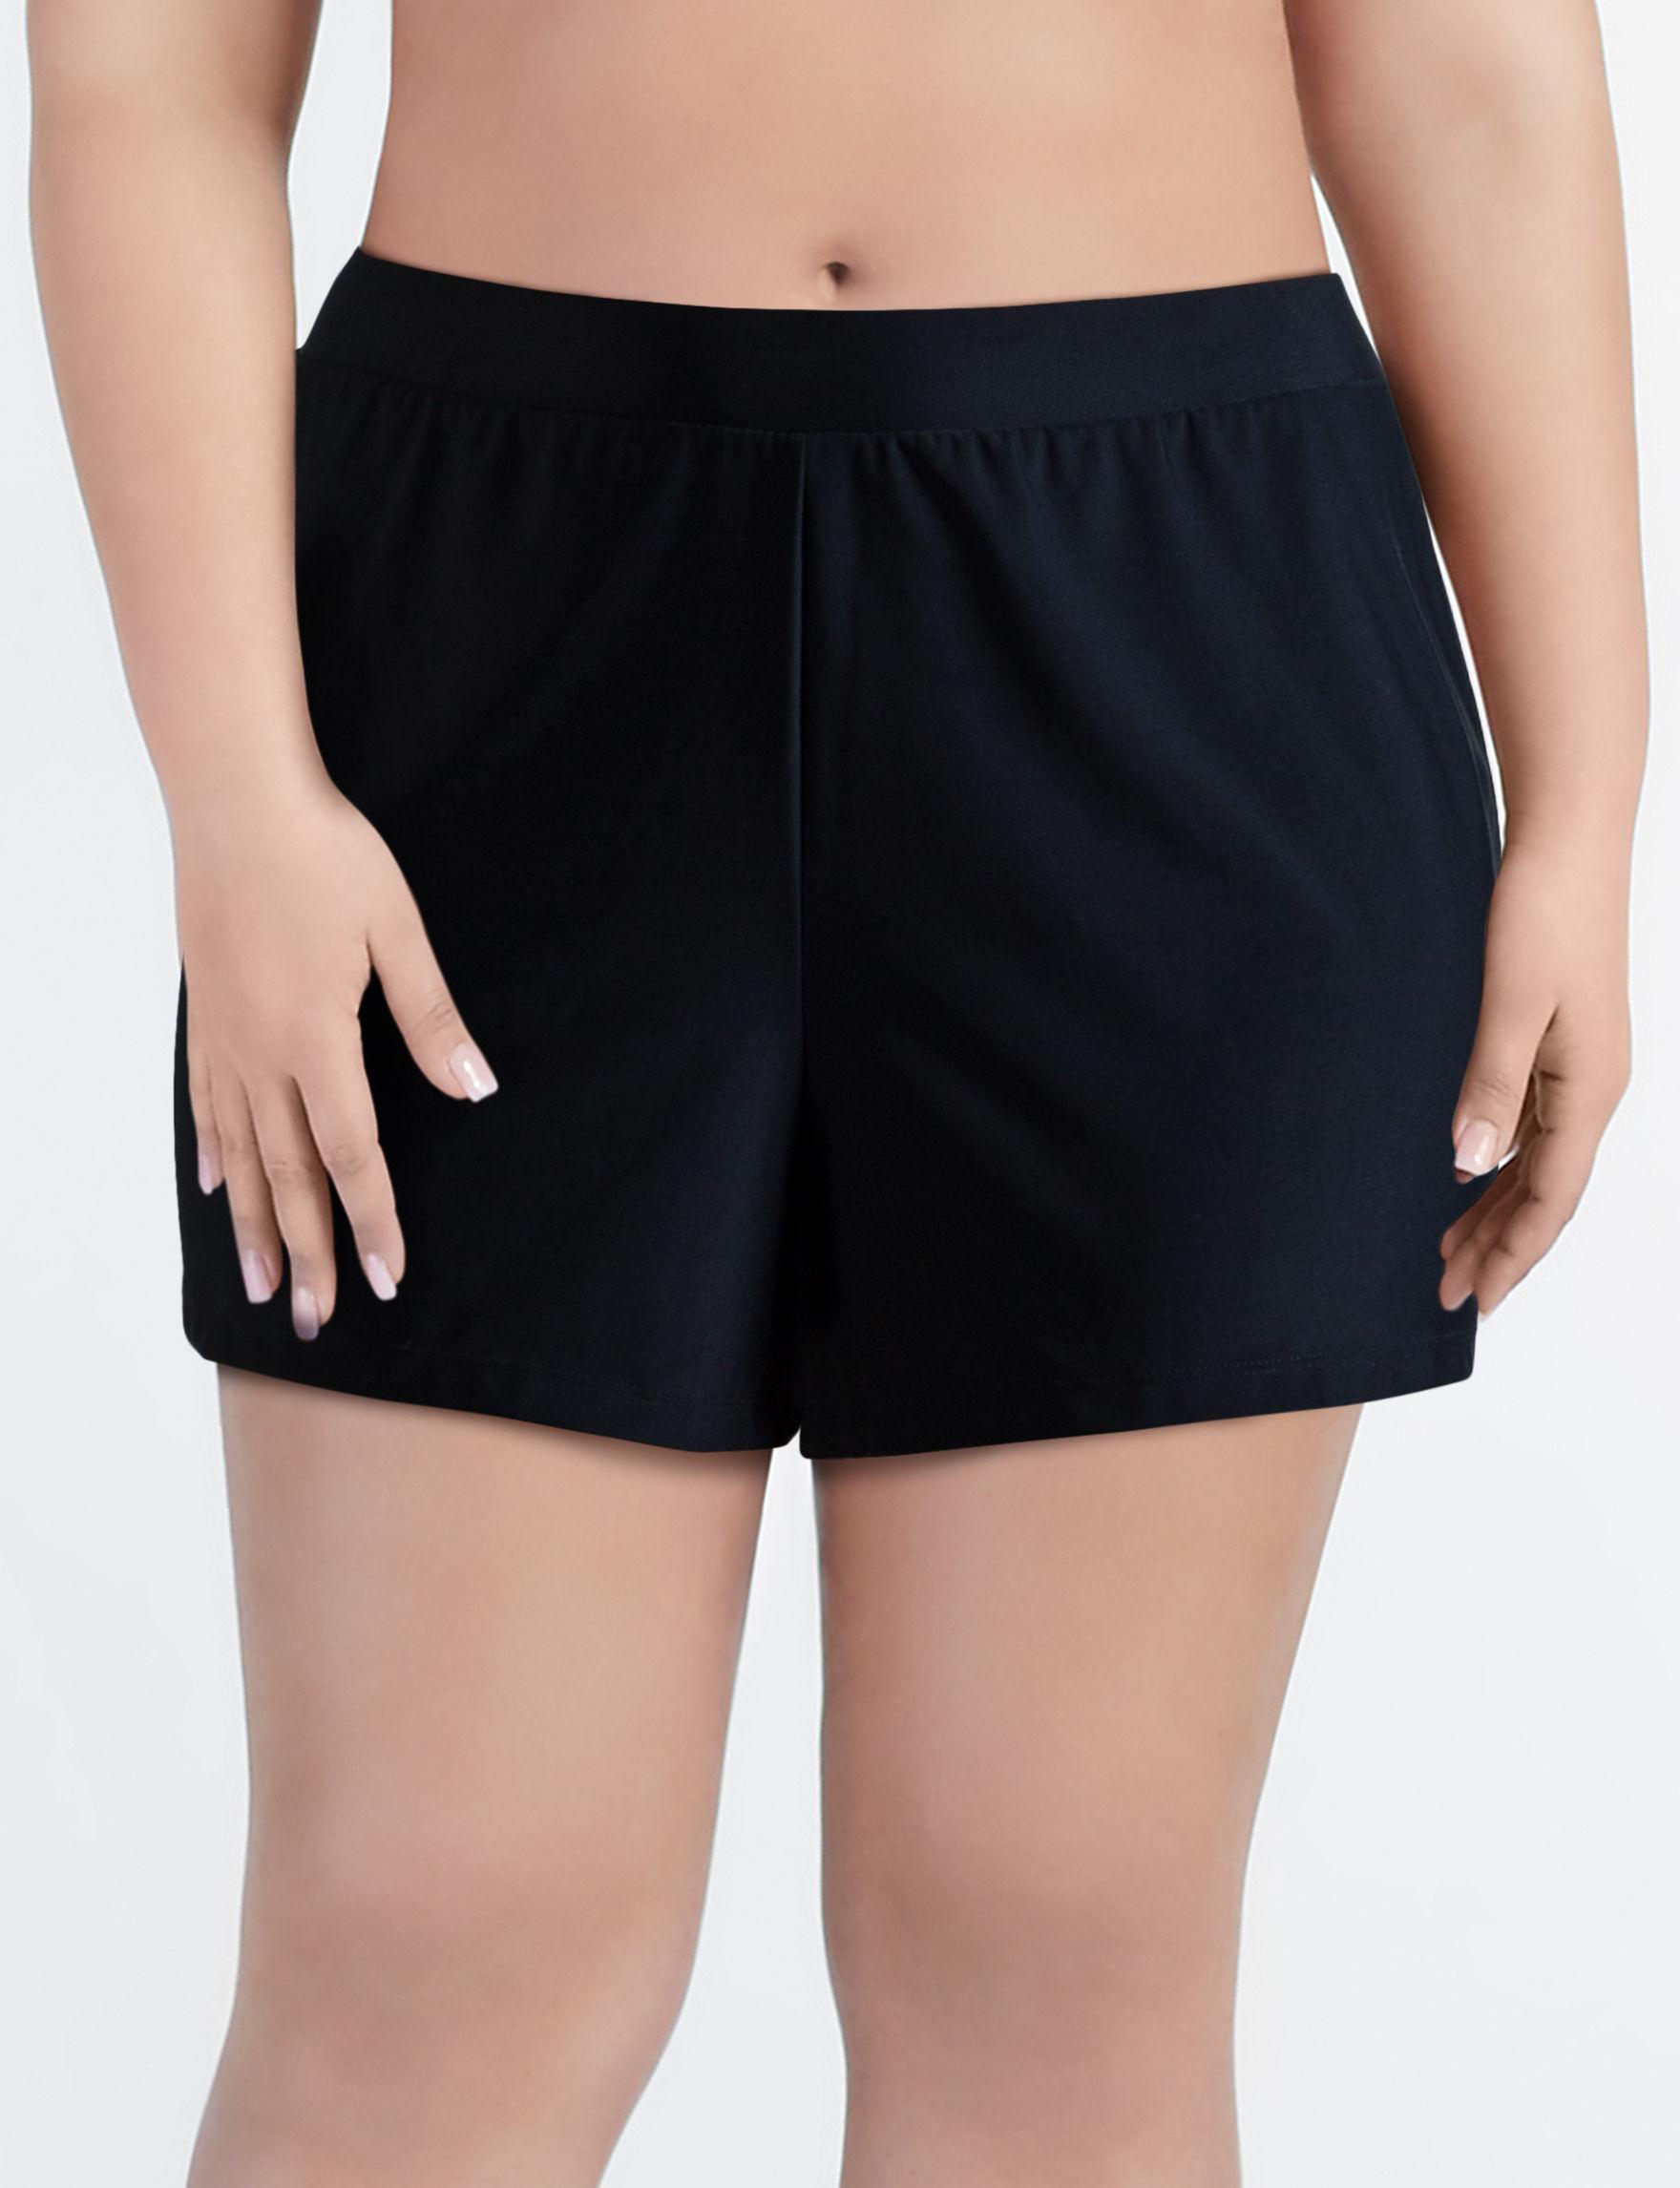 Beach Diva Black Swimsuit Bottoms Boyshort